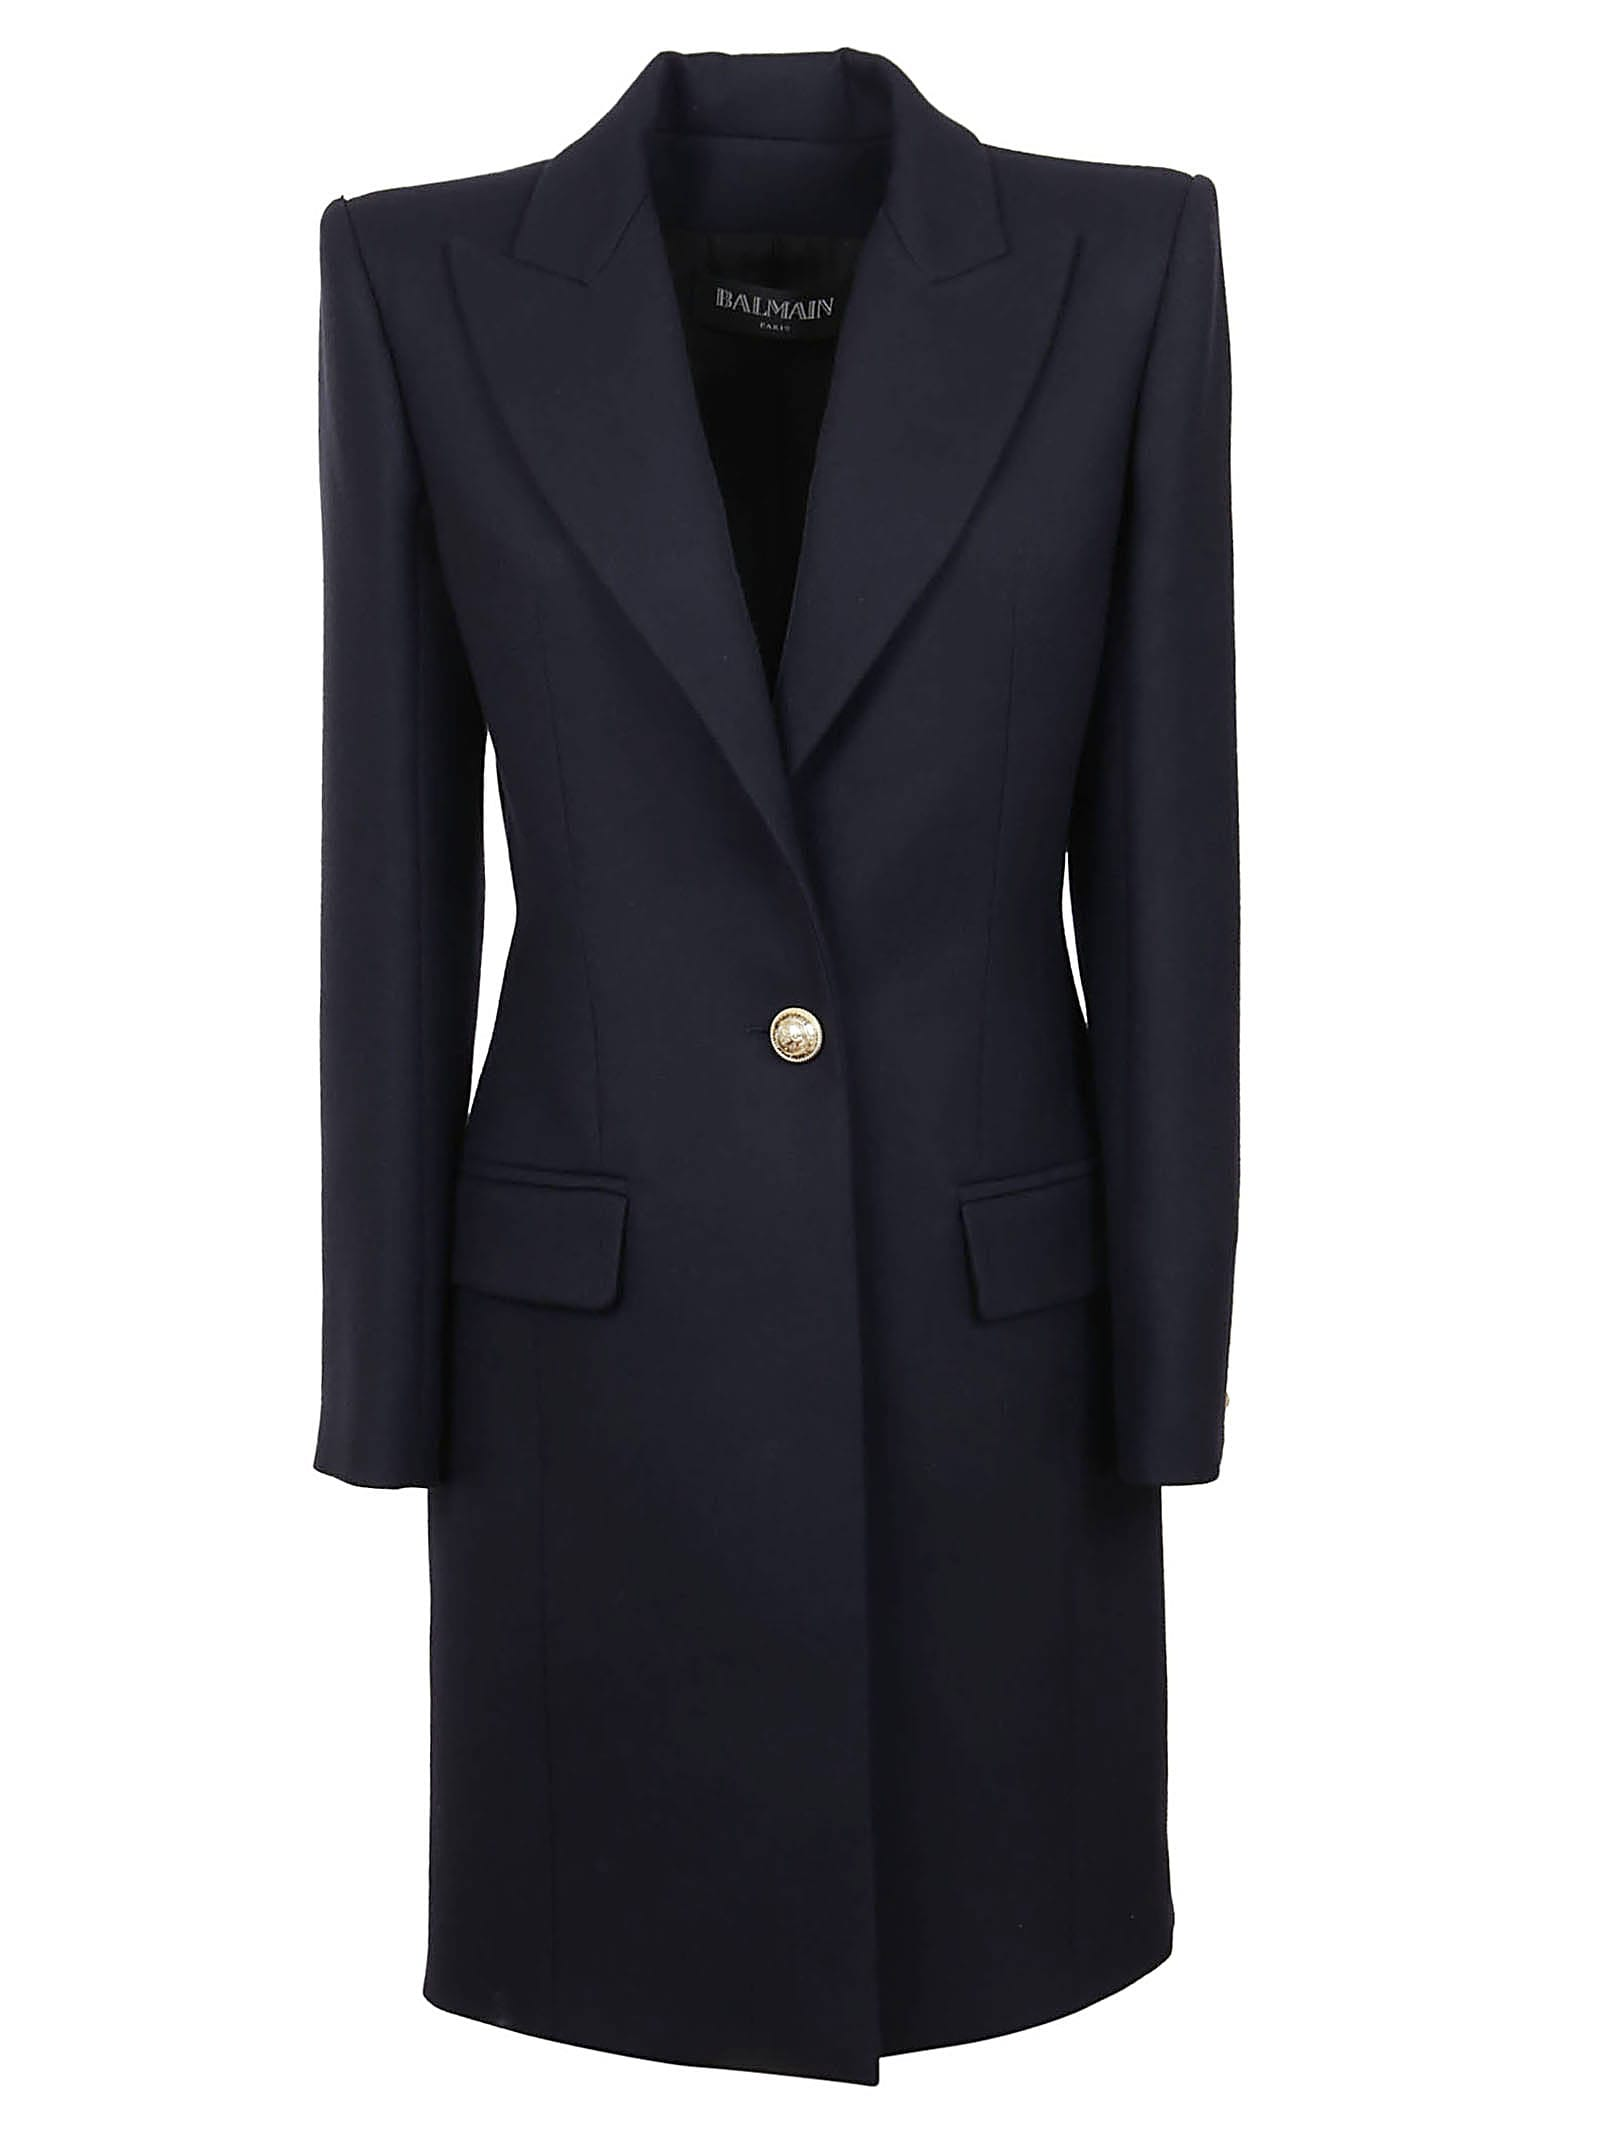 Balmain One Button Wool Coat